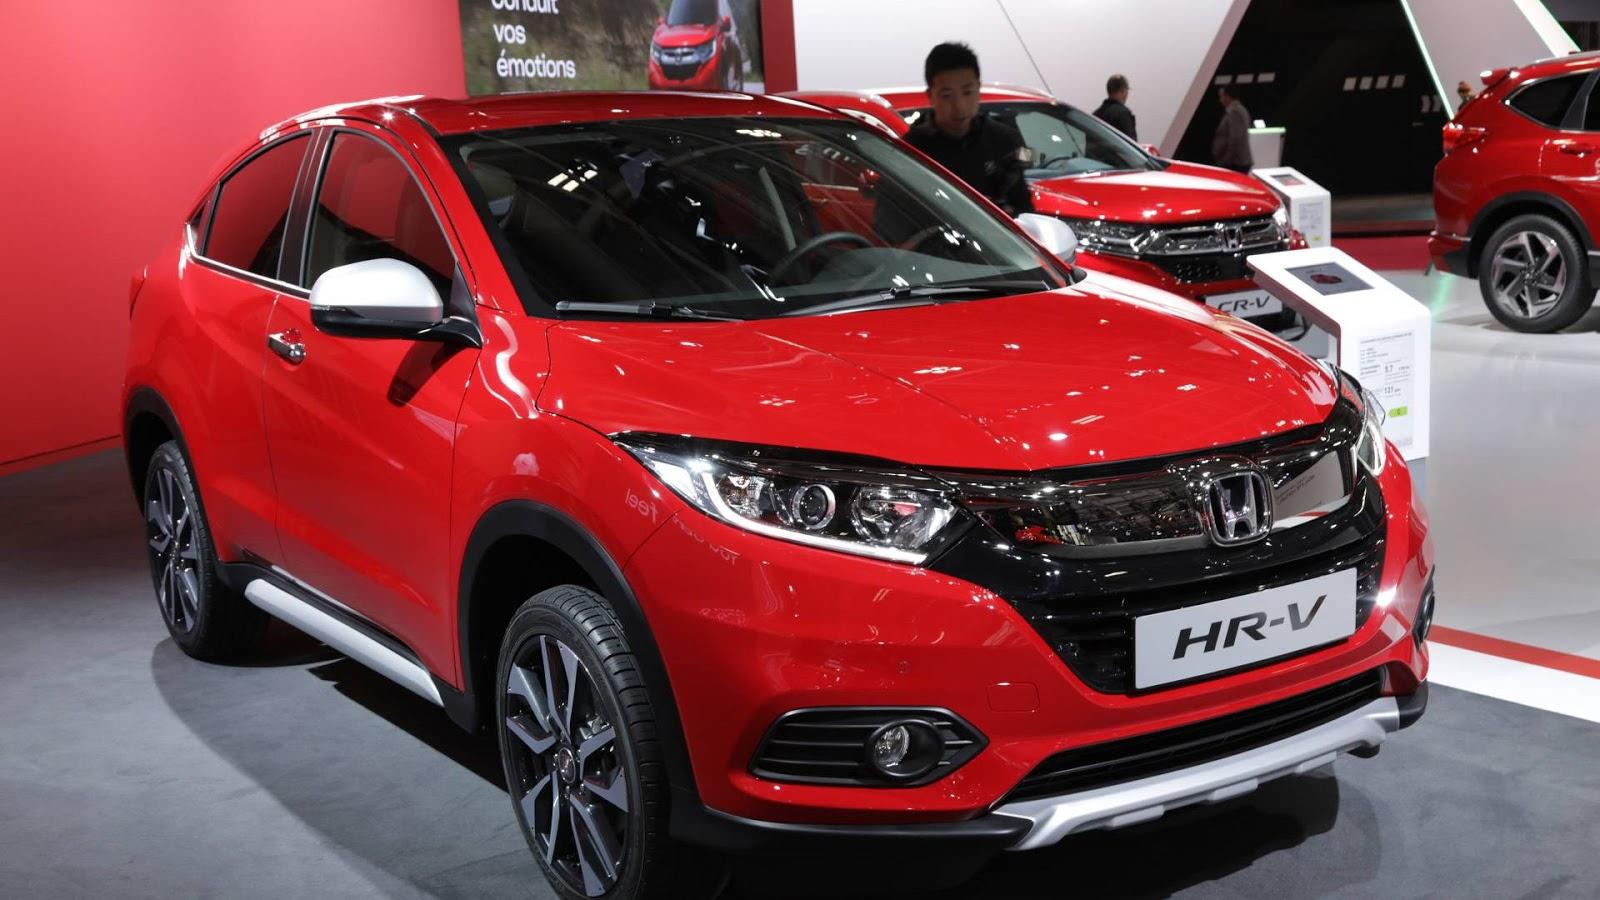 Kelebihan Harga Mobil Bekas Honda Spesifikasi